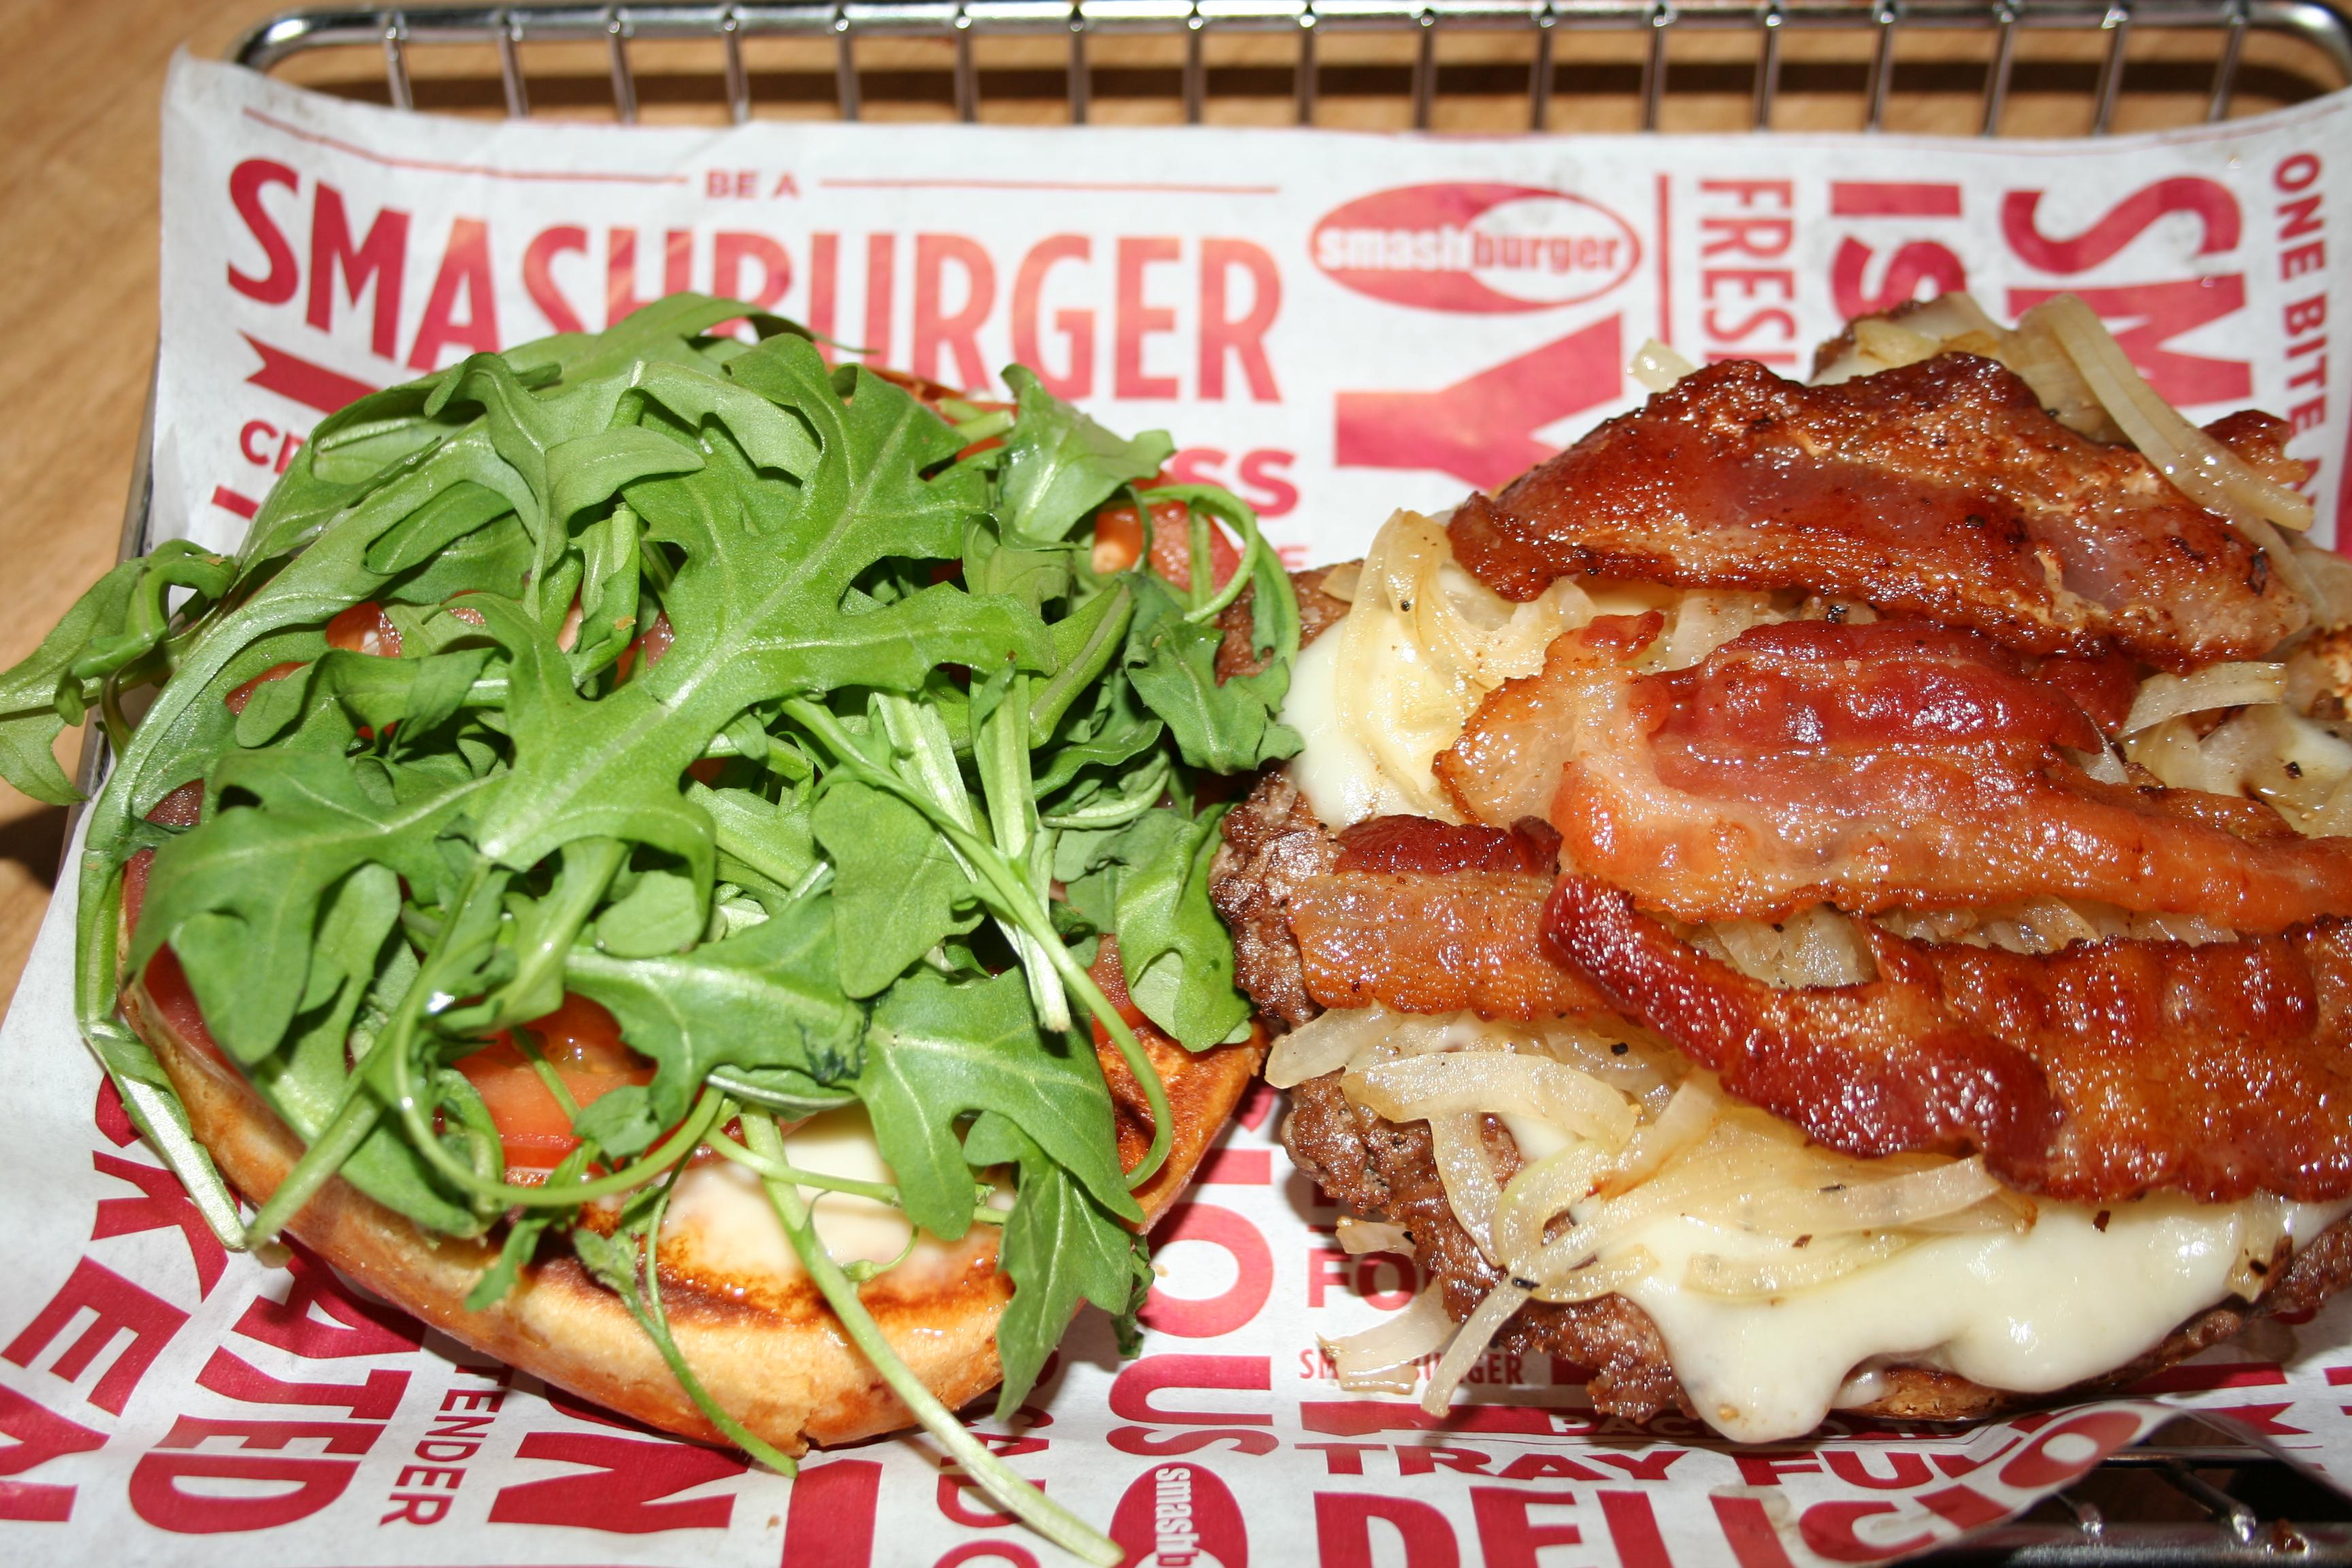 Smashburger's Capital burger. (Photo: Mark Heckathorn/DC on Heels)